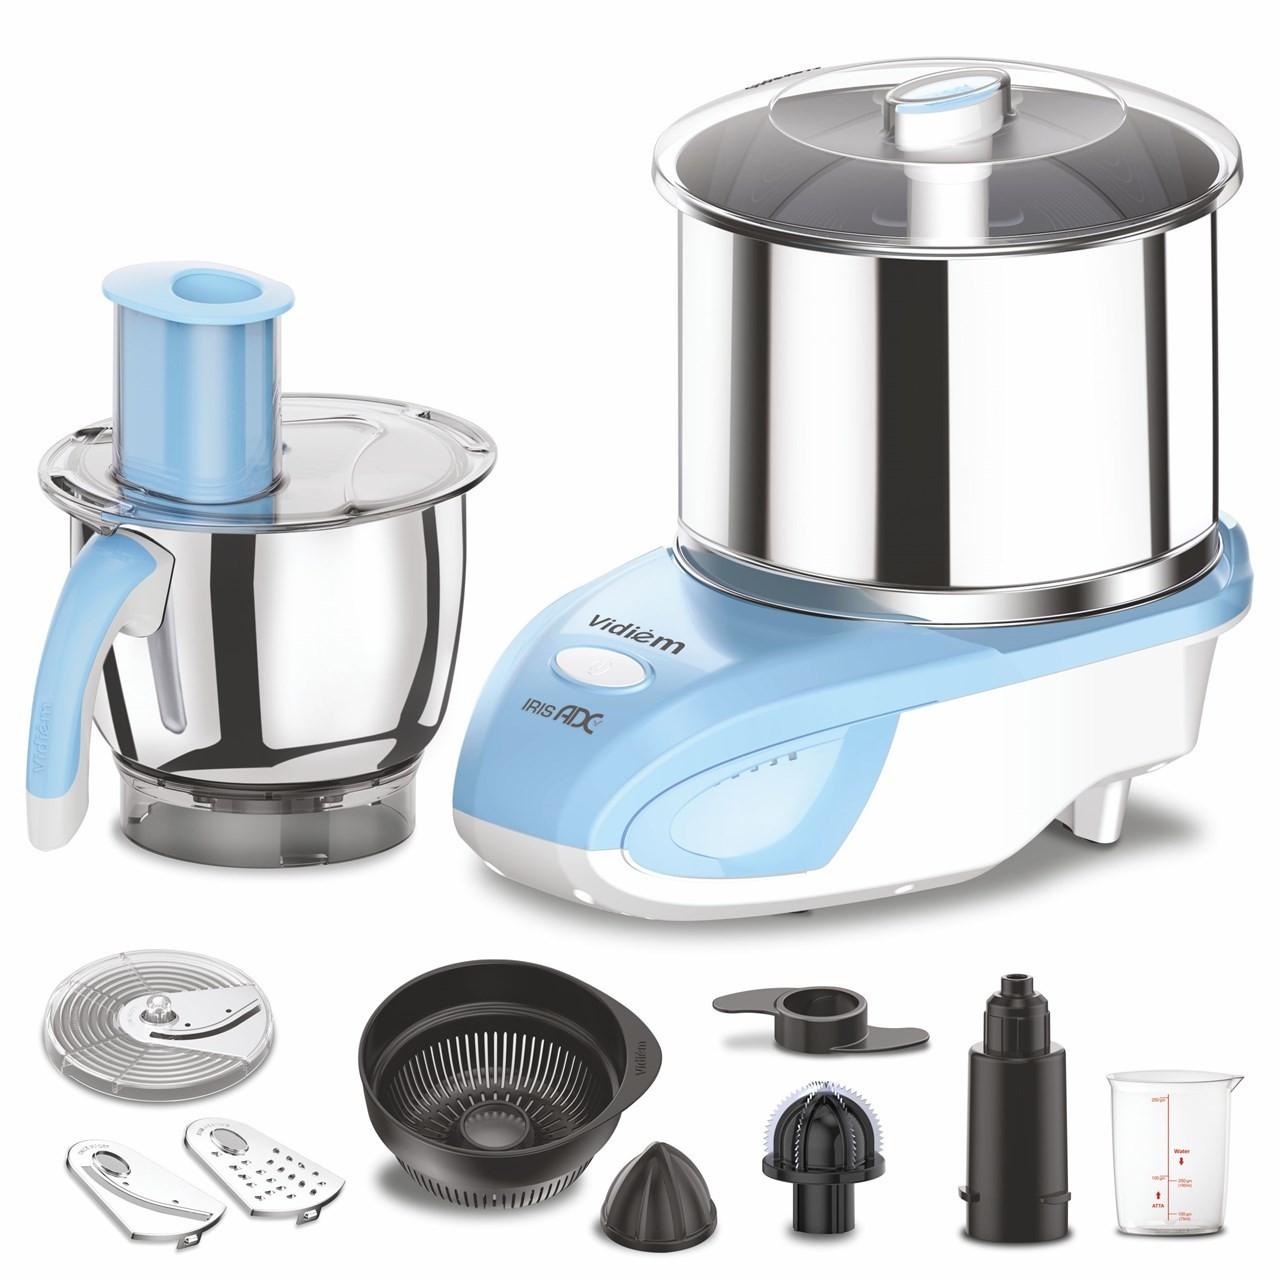 iris-adc-wet-grinder-20-lt-with-multi-chef-jar-food-processor